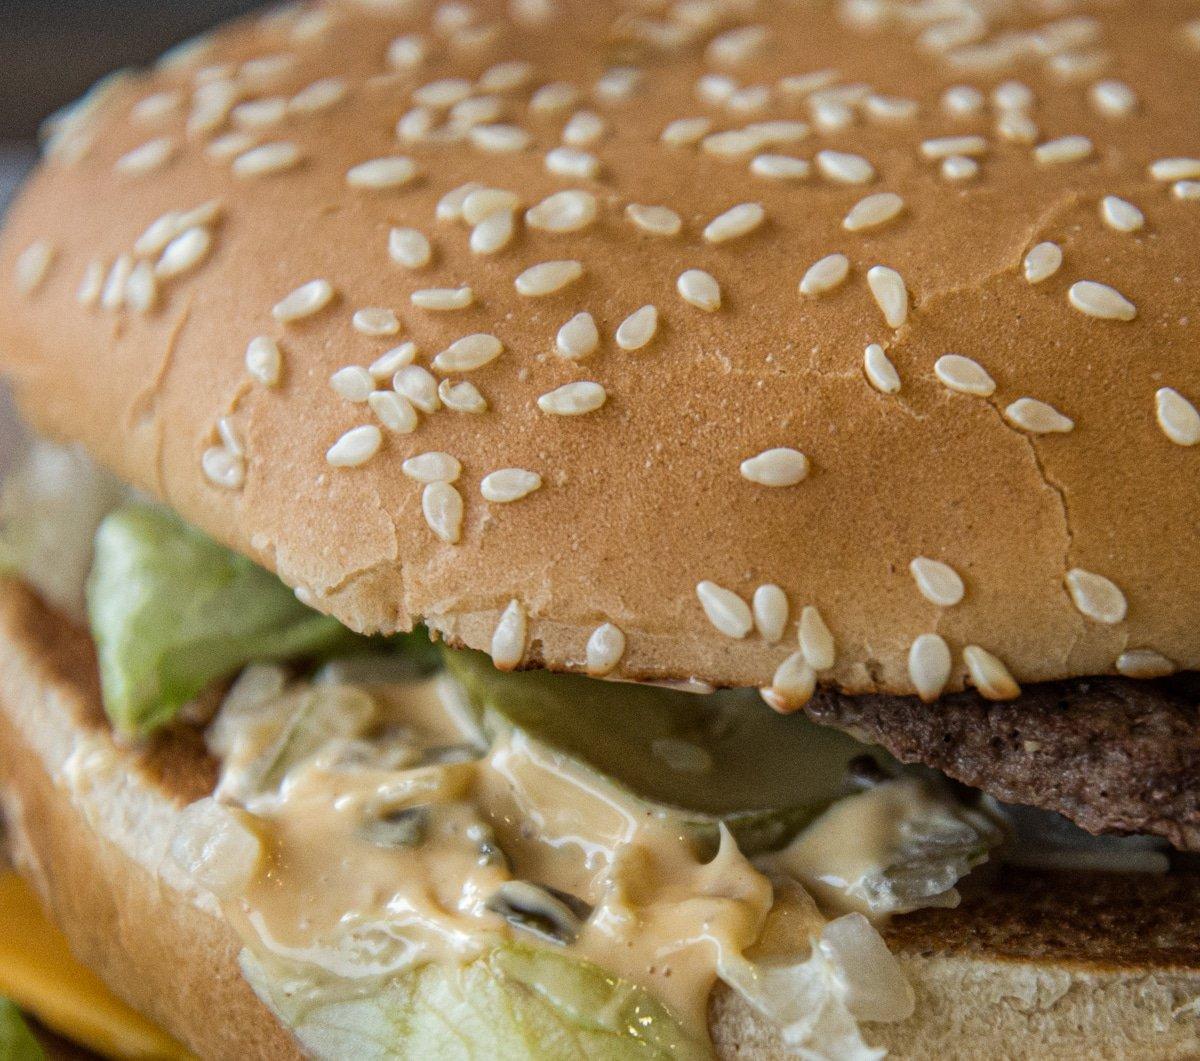 burger glop